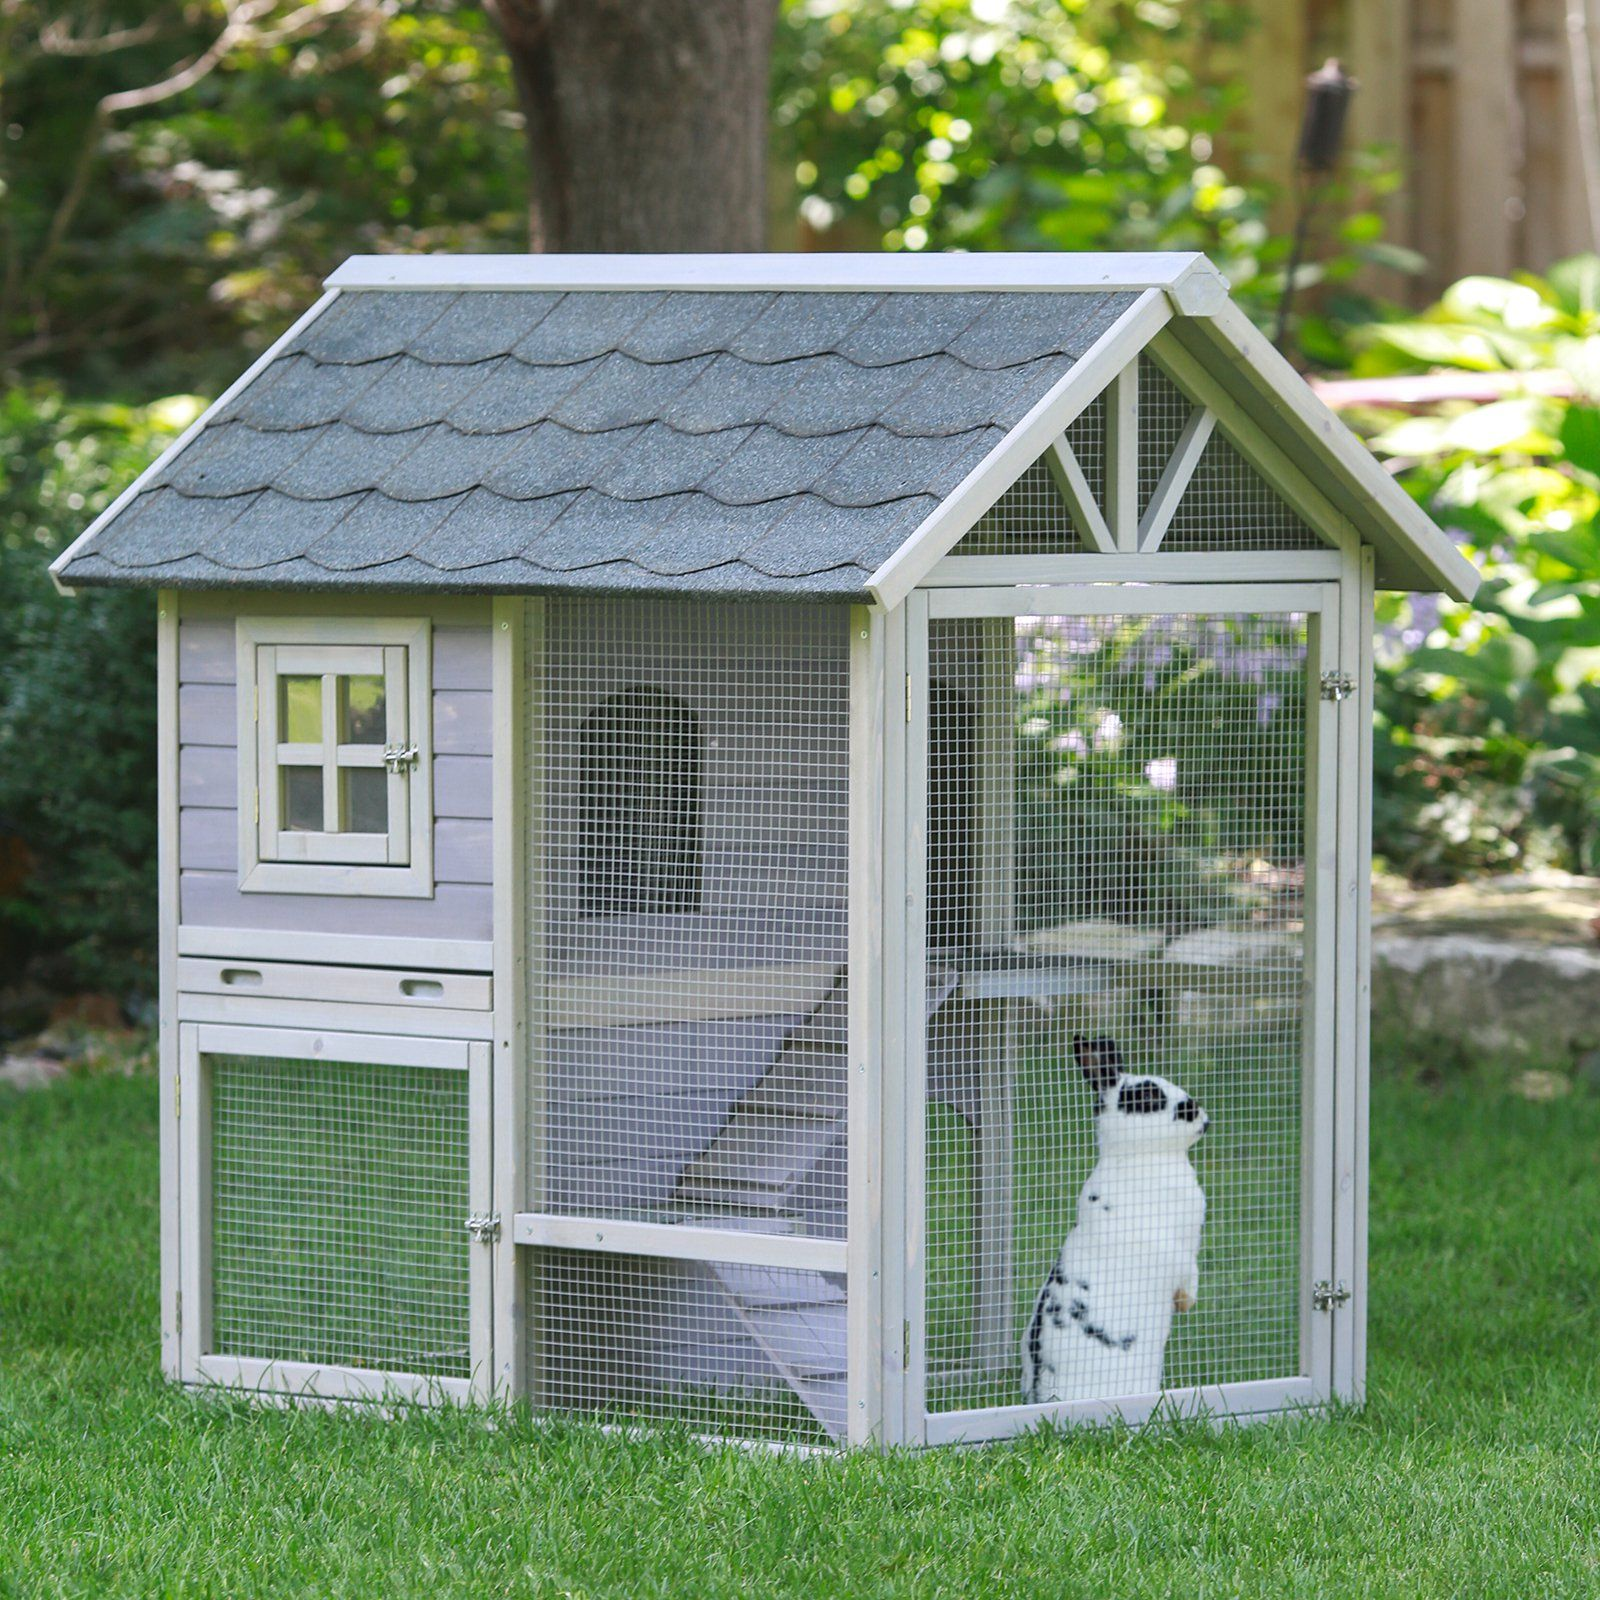 stilt rabbit amazon hutch sale handmade garden house the for dp advantek hutches patio ca lawn